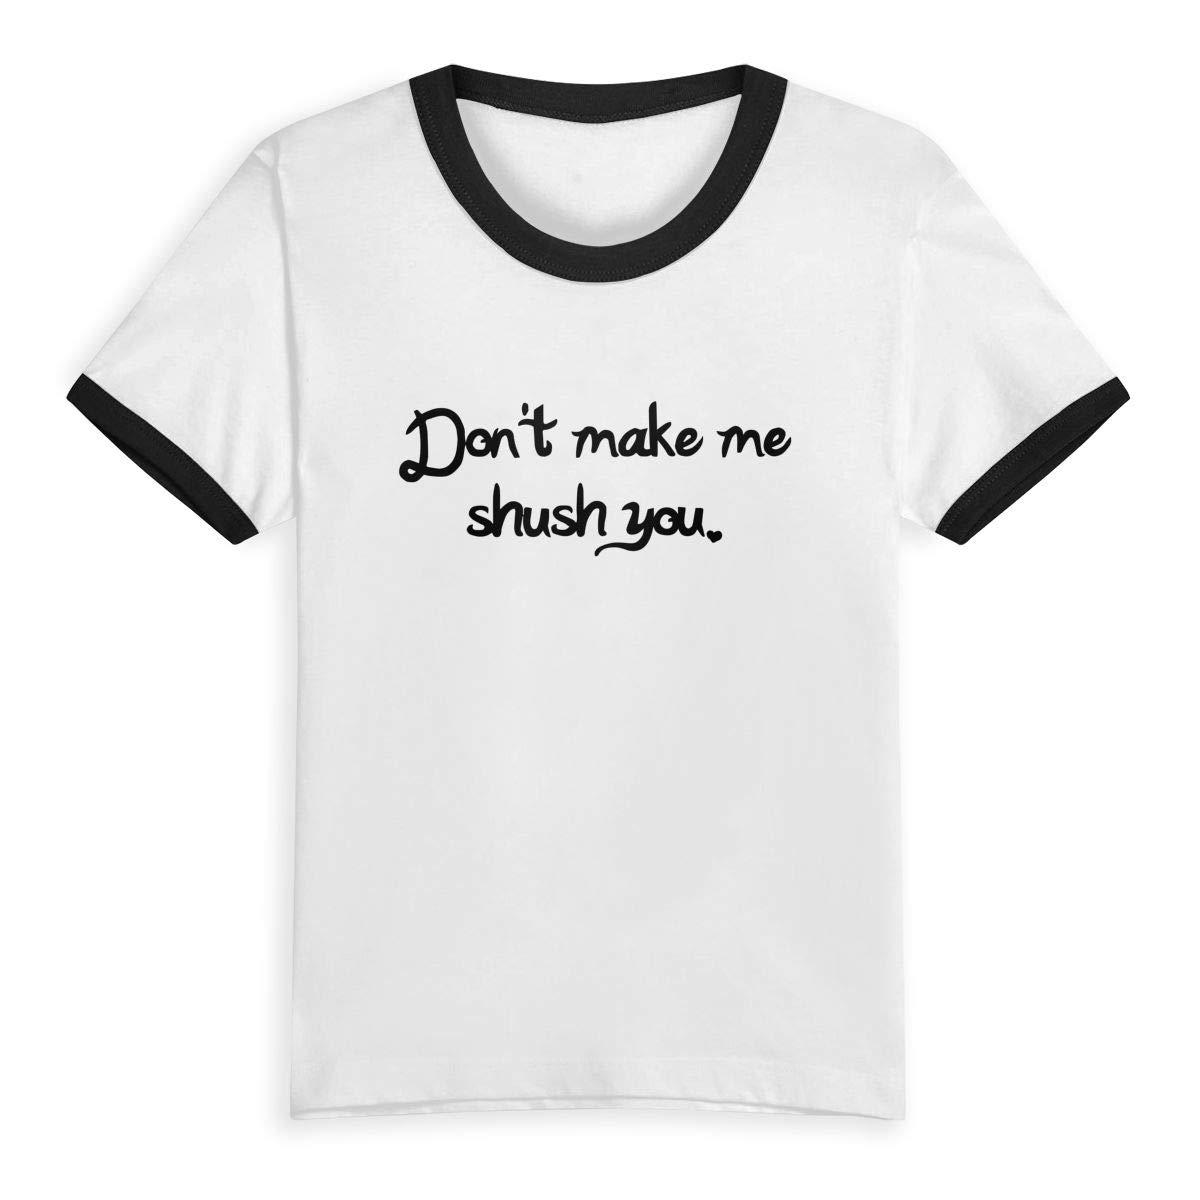 CY SHOP Dont Make ME Shush You Childrens Boys Girls Contrast Short Sleeve T-Shirt